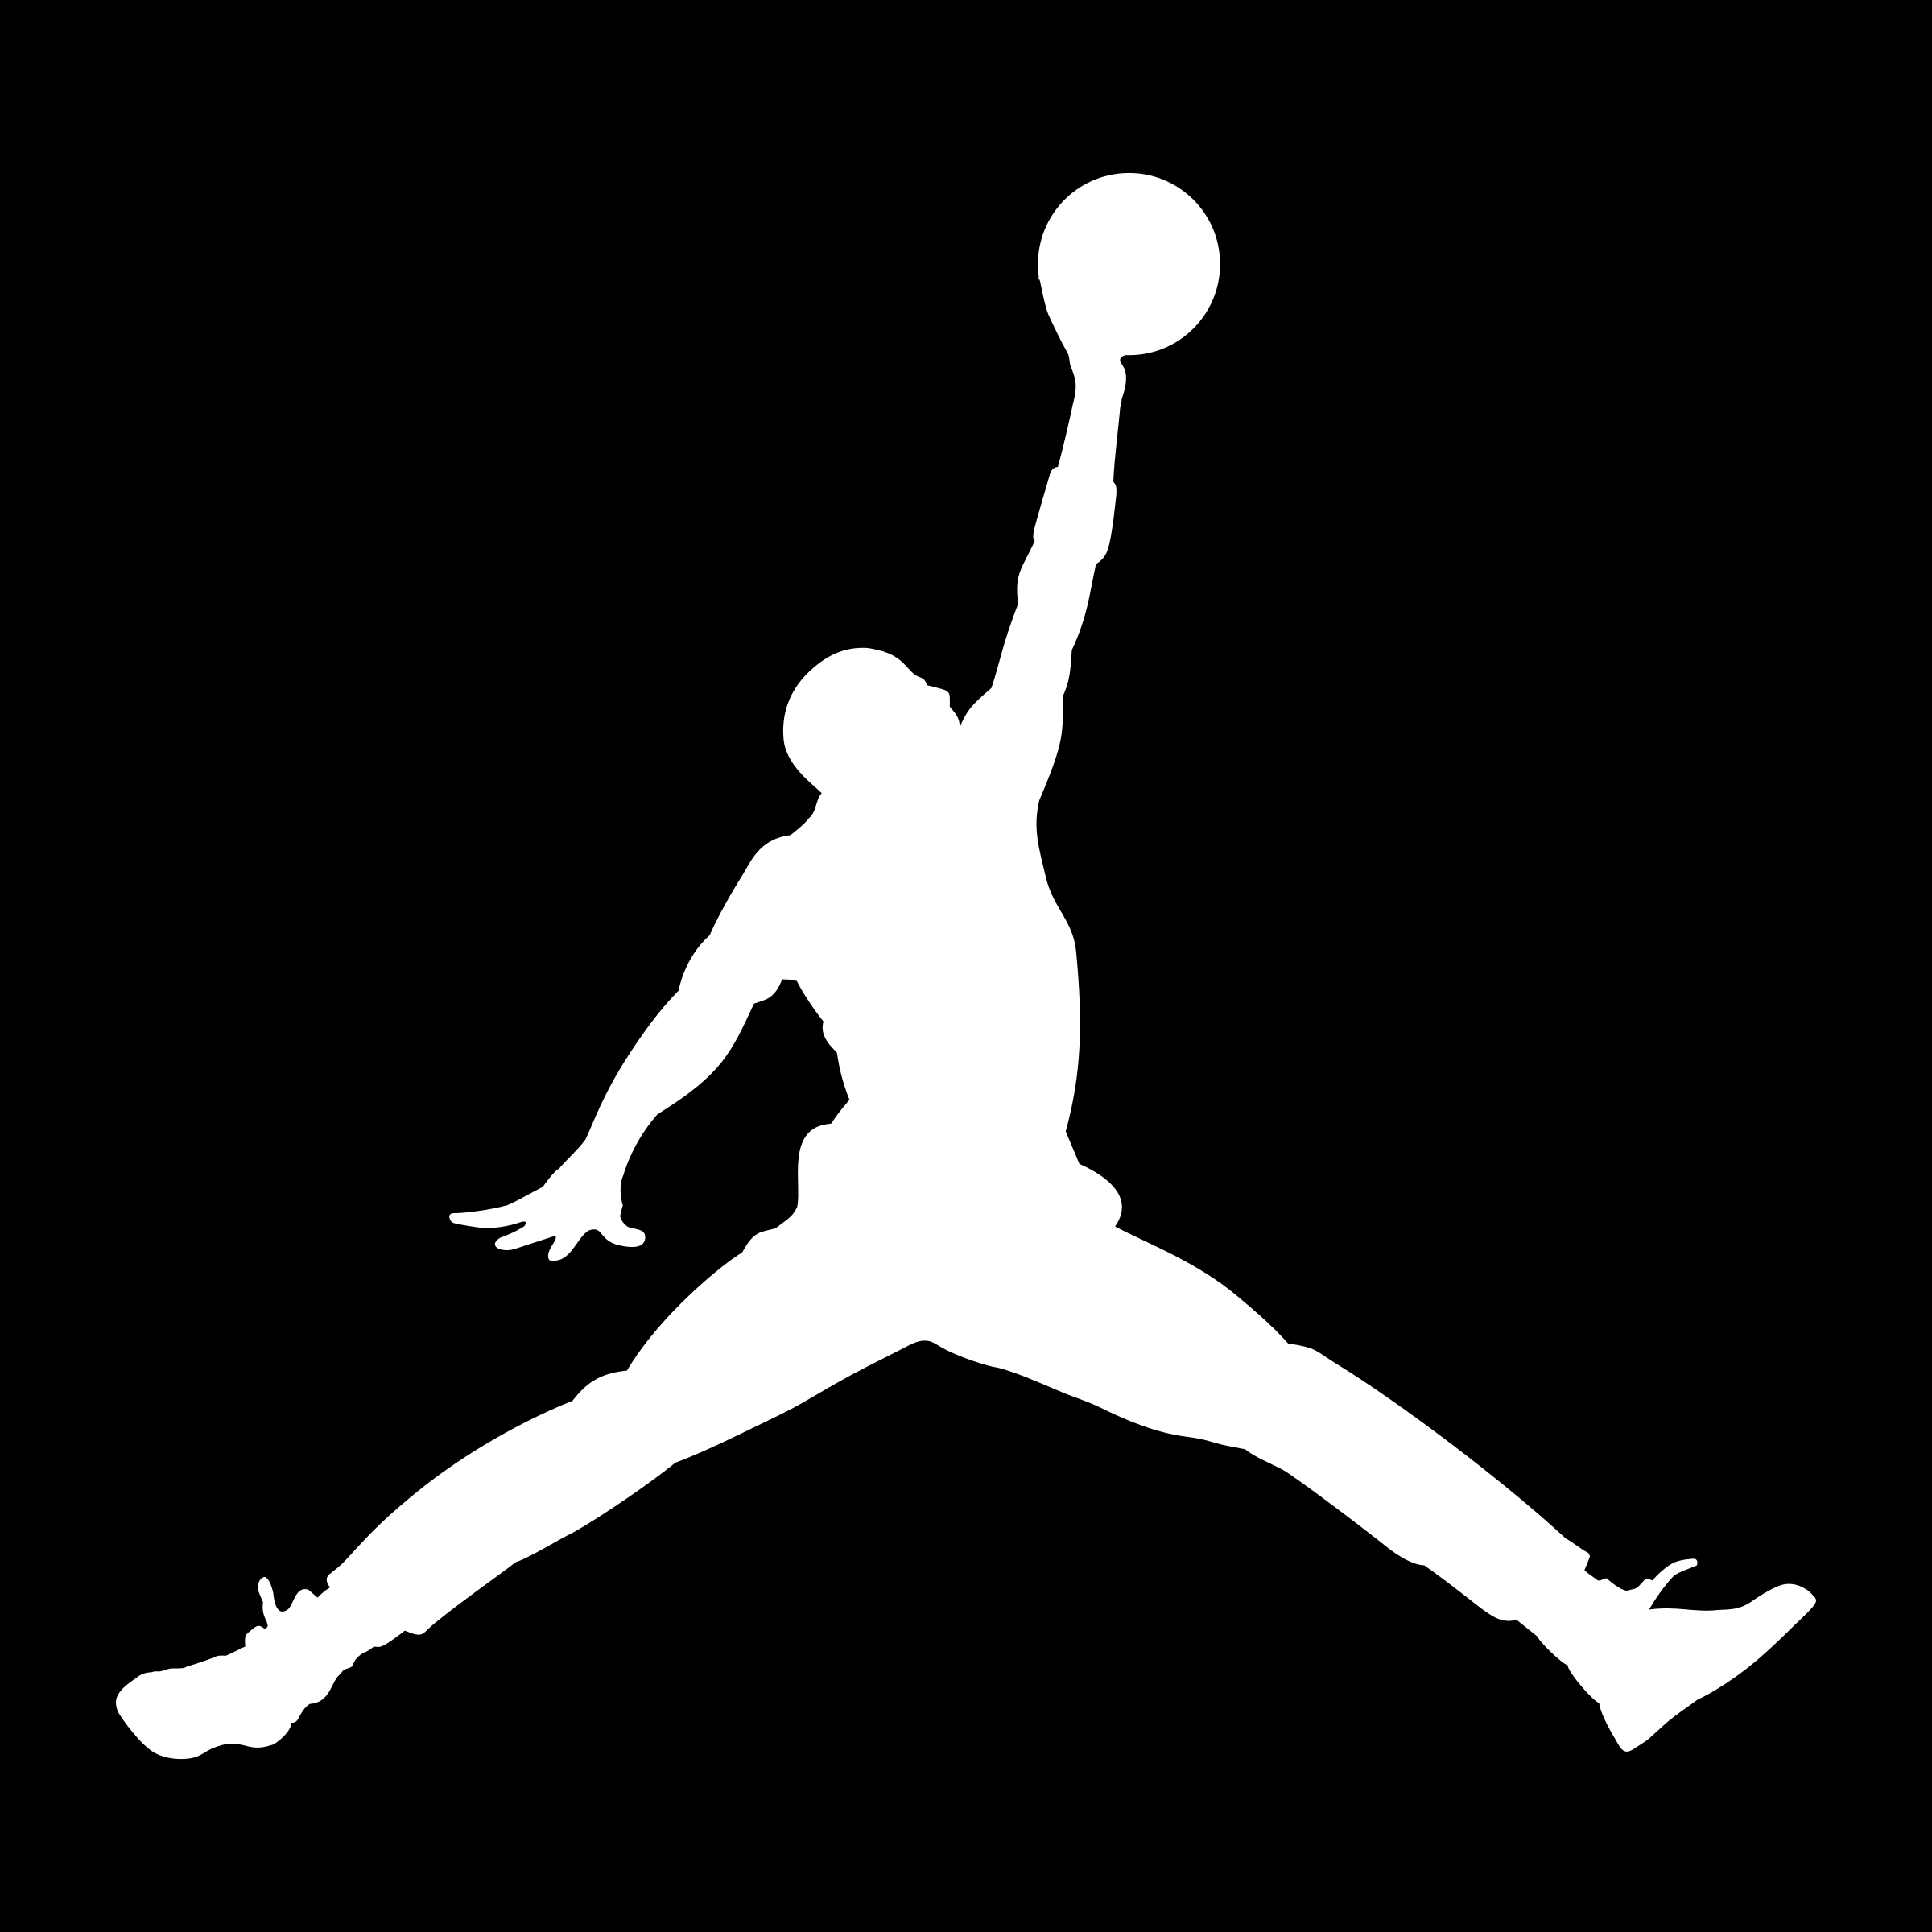 Air Jordan Logo Black And White